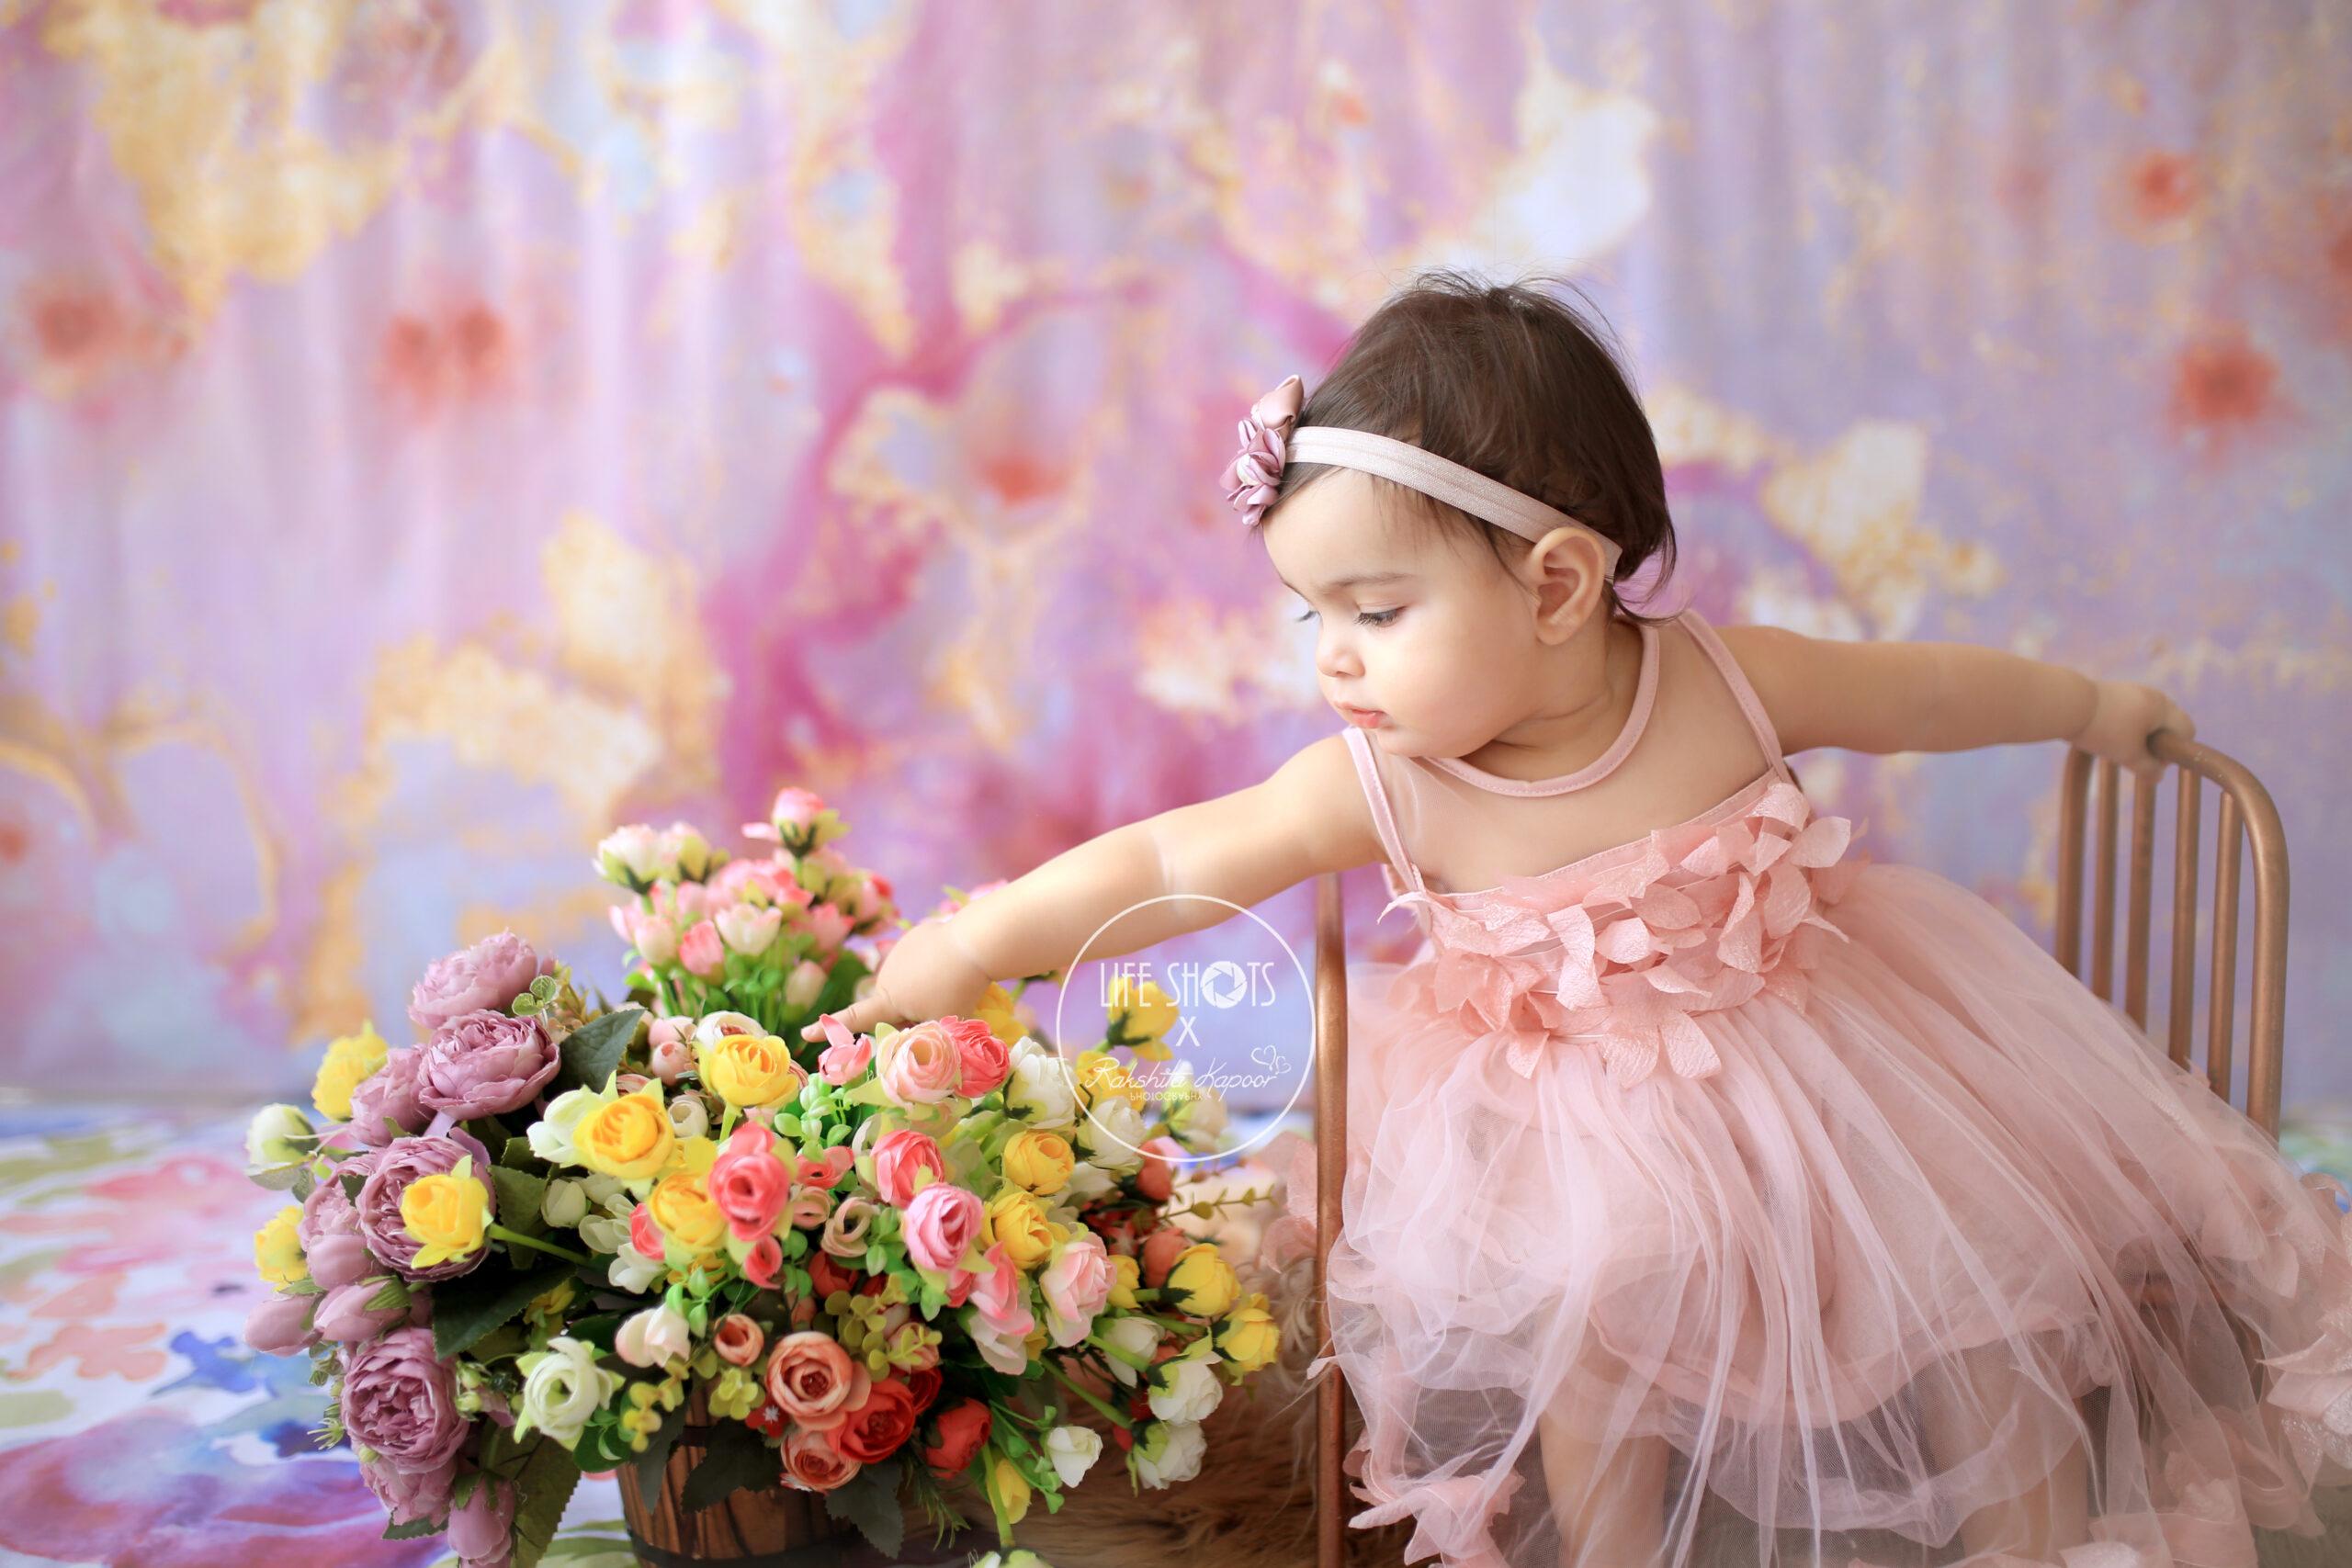 Best Sitter Baby photographer in Delhi NCR Noida Gurgaon   Rakshita Kapoor